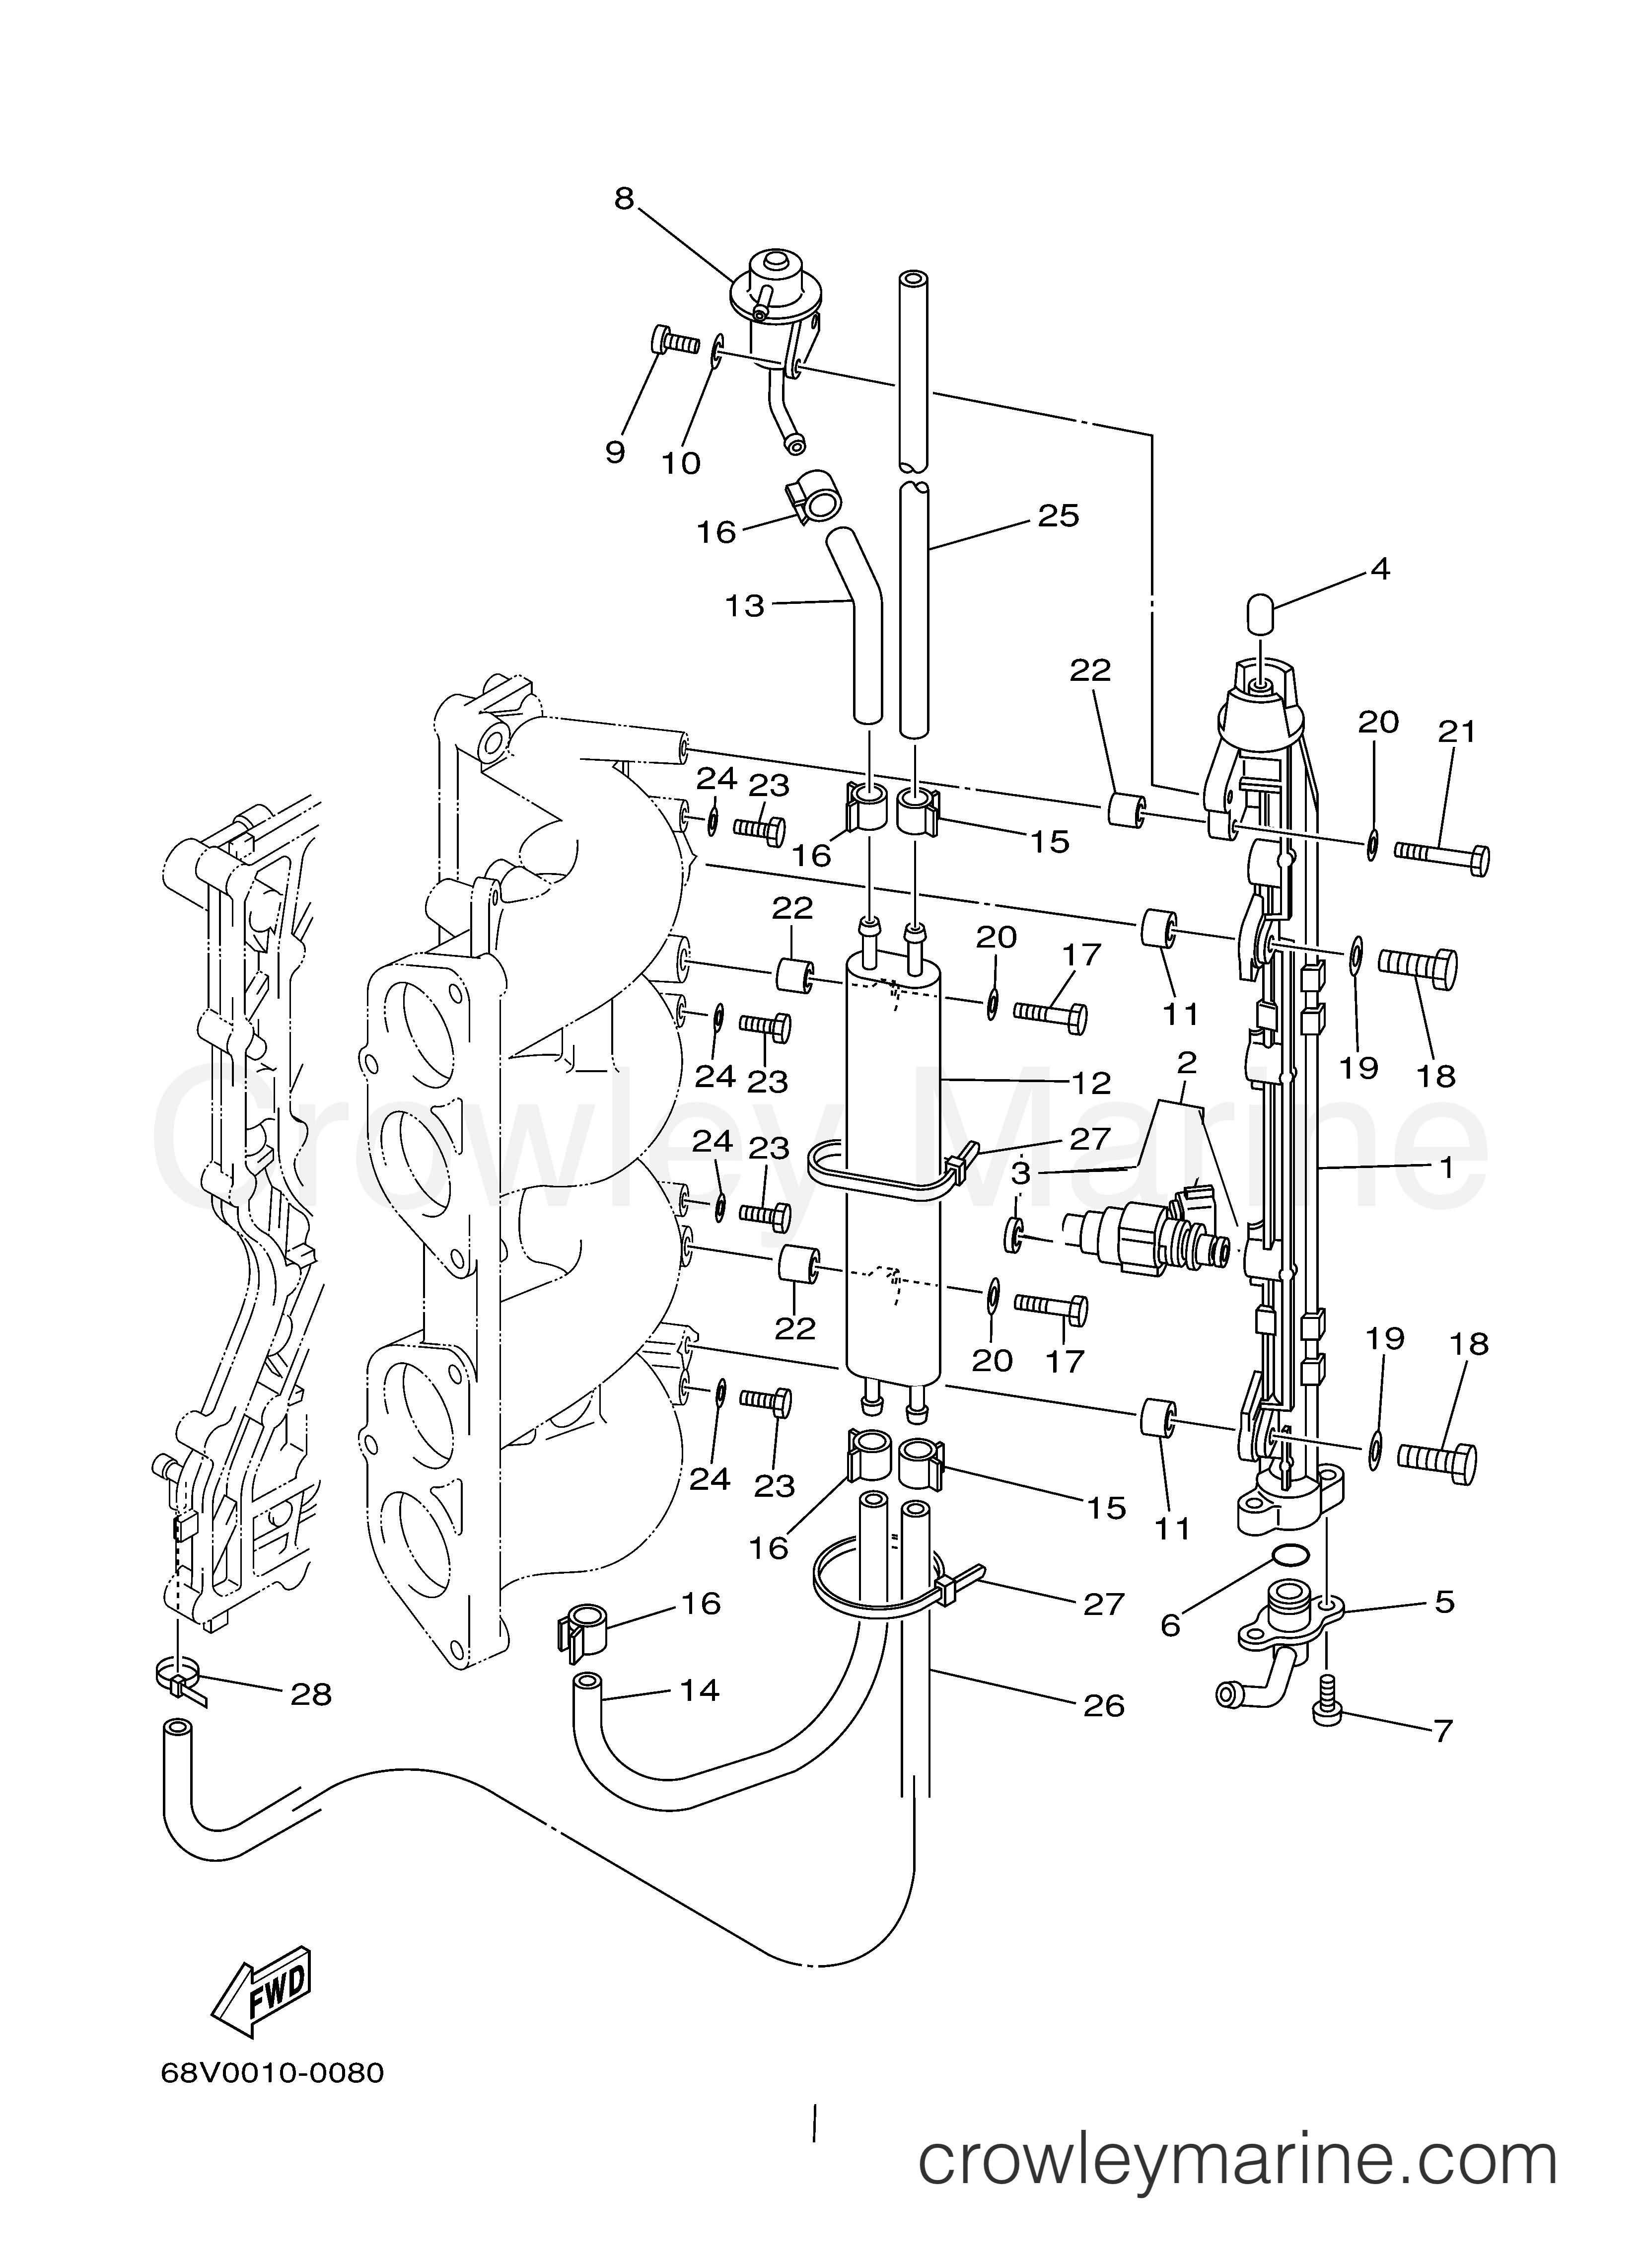 fuel injection nozzle